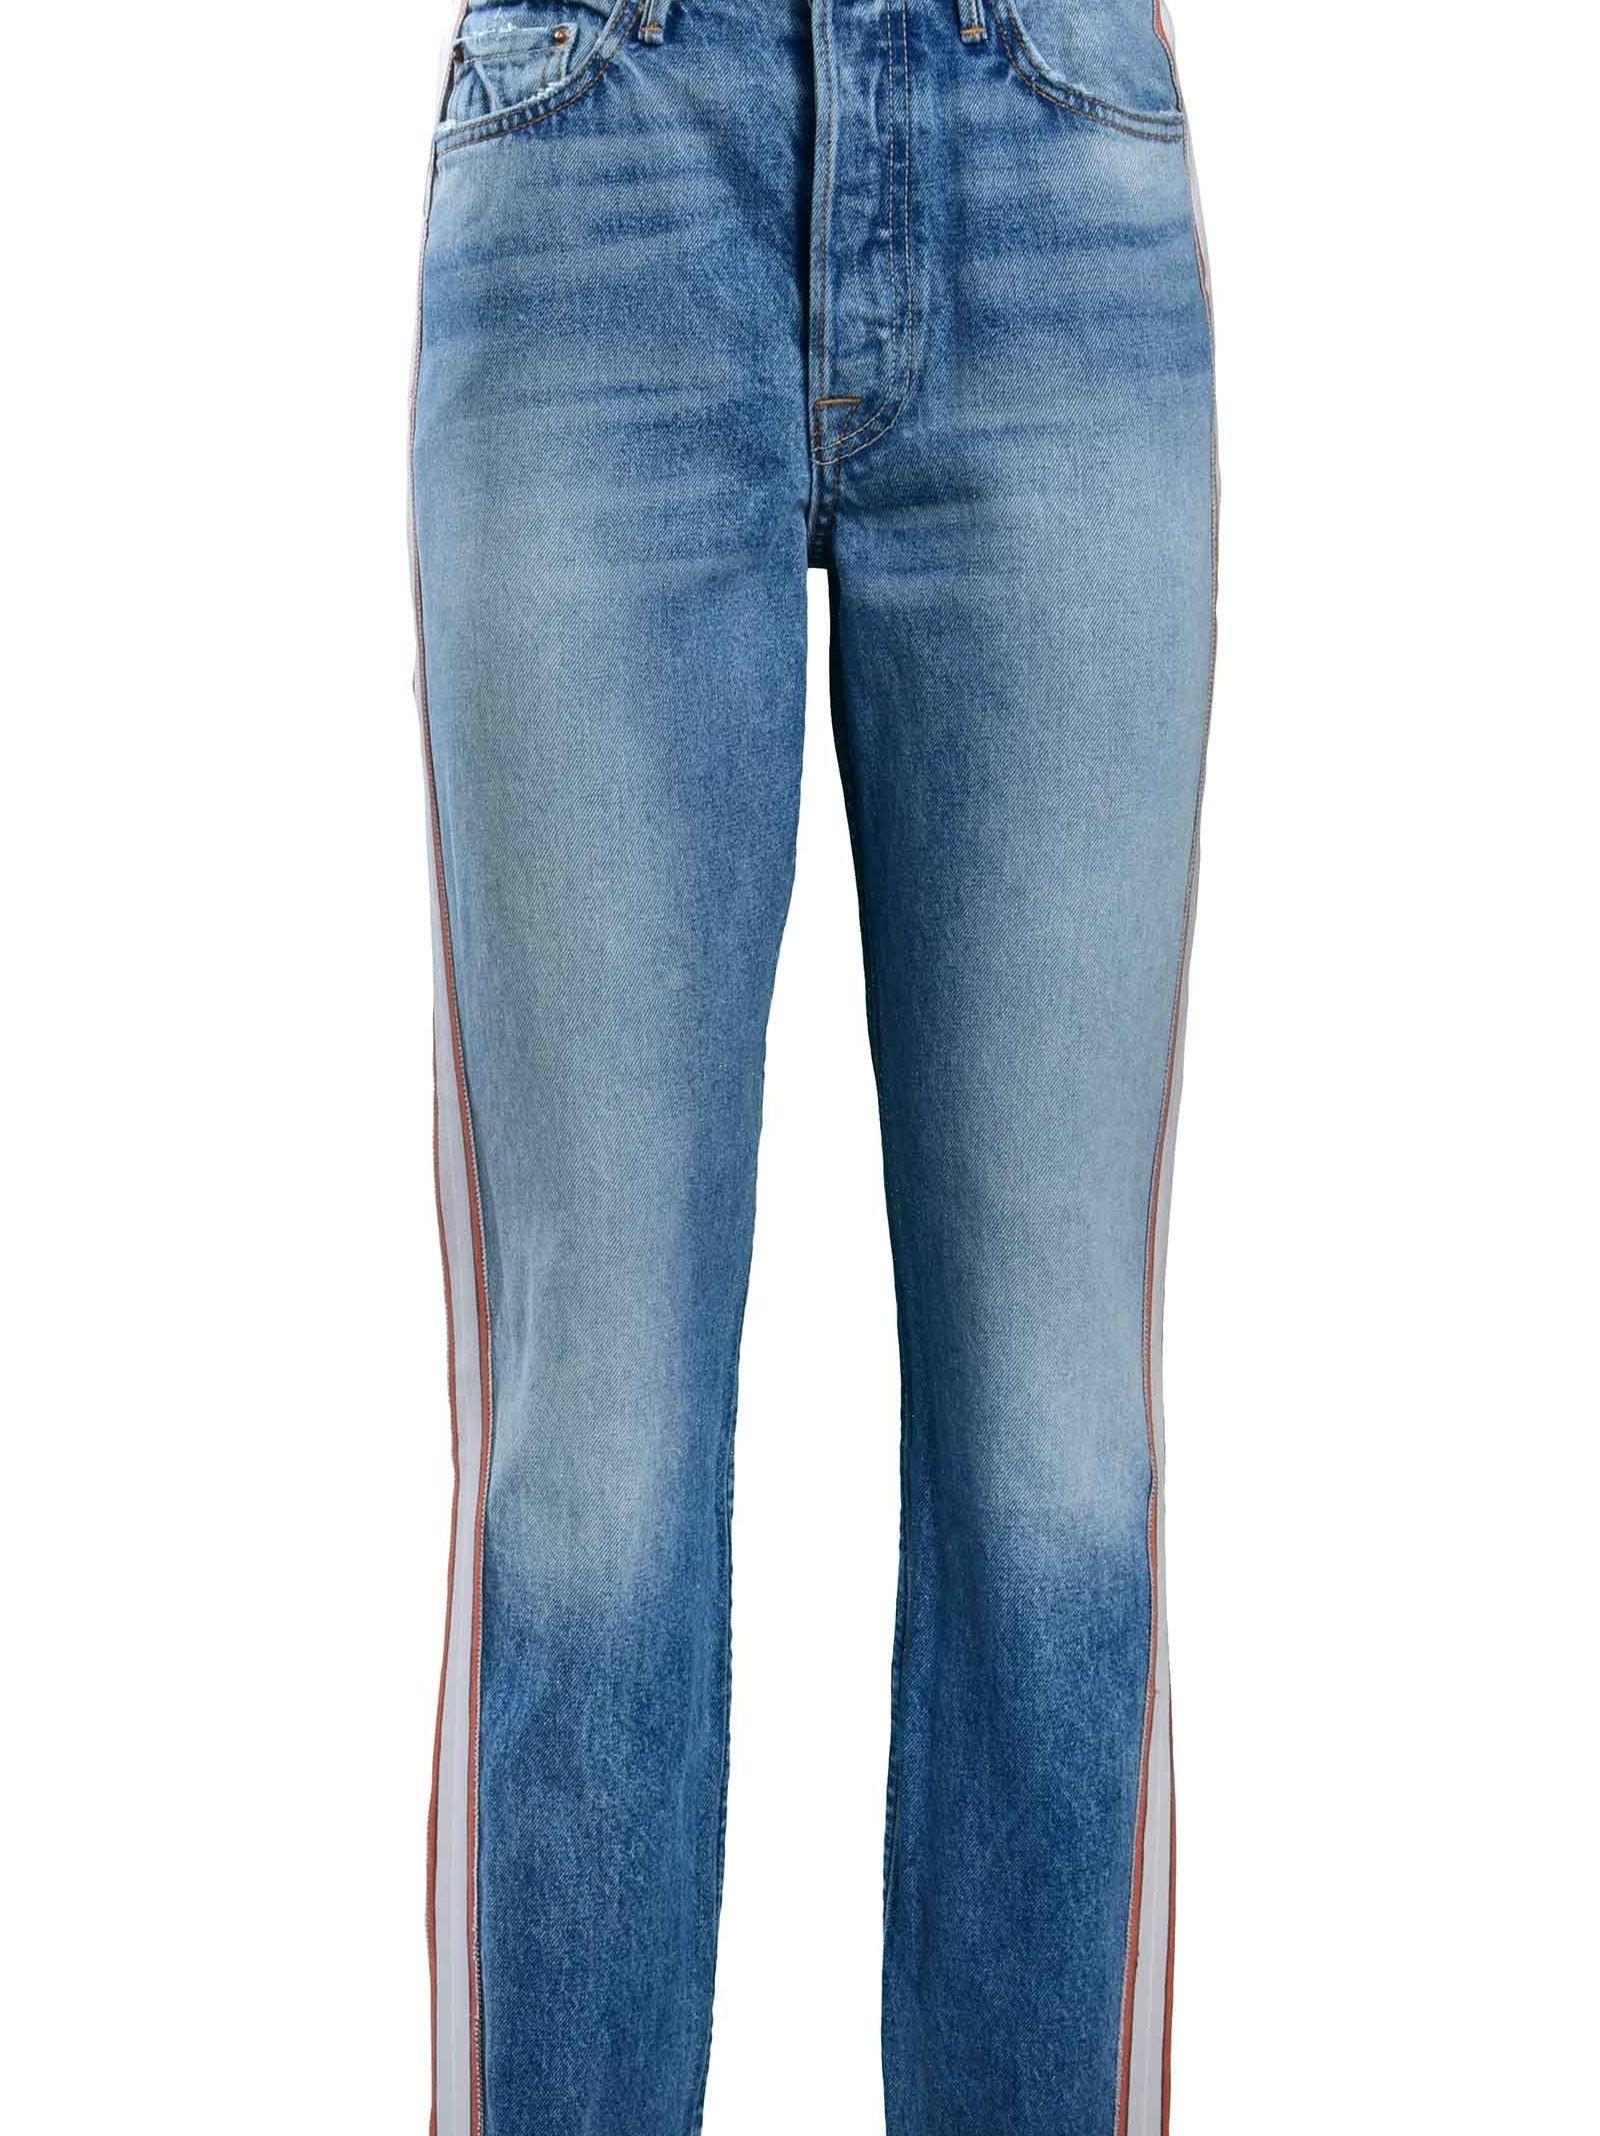 Grlfrnd Straight Leg Jeans